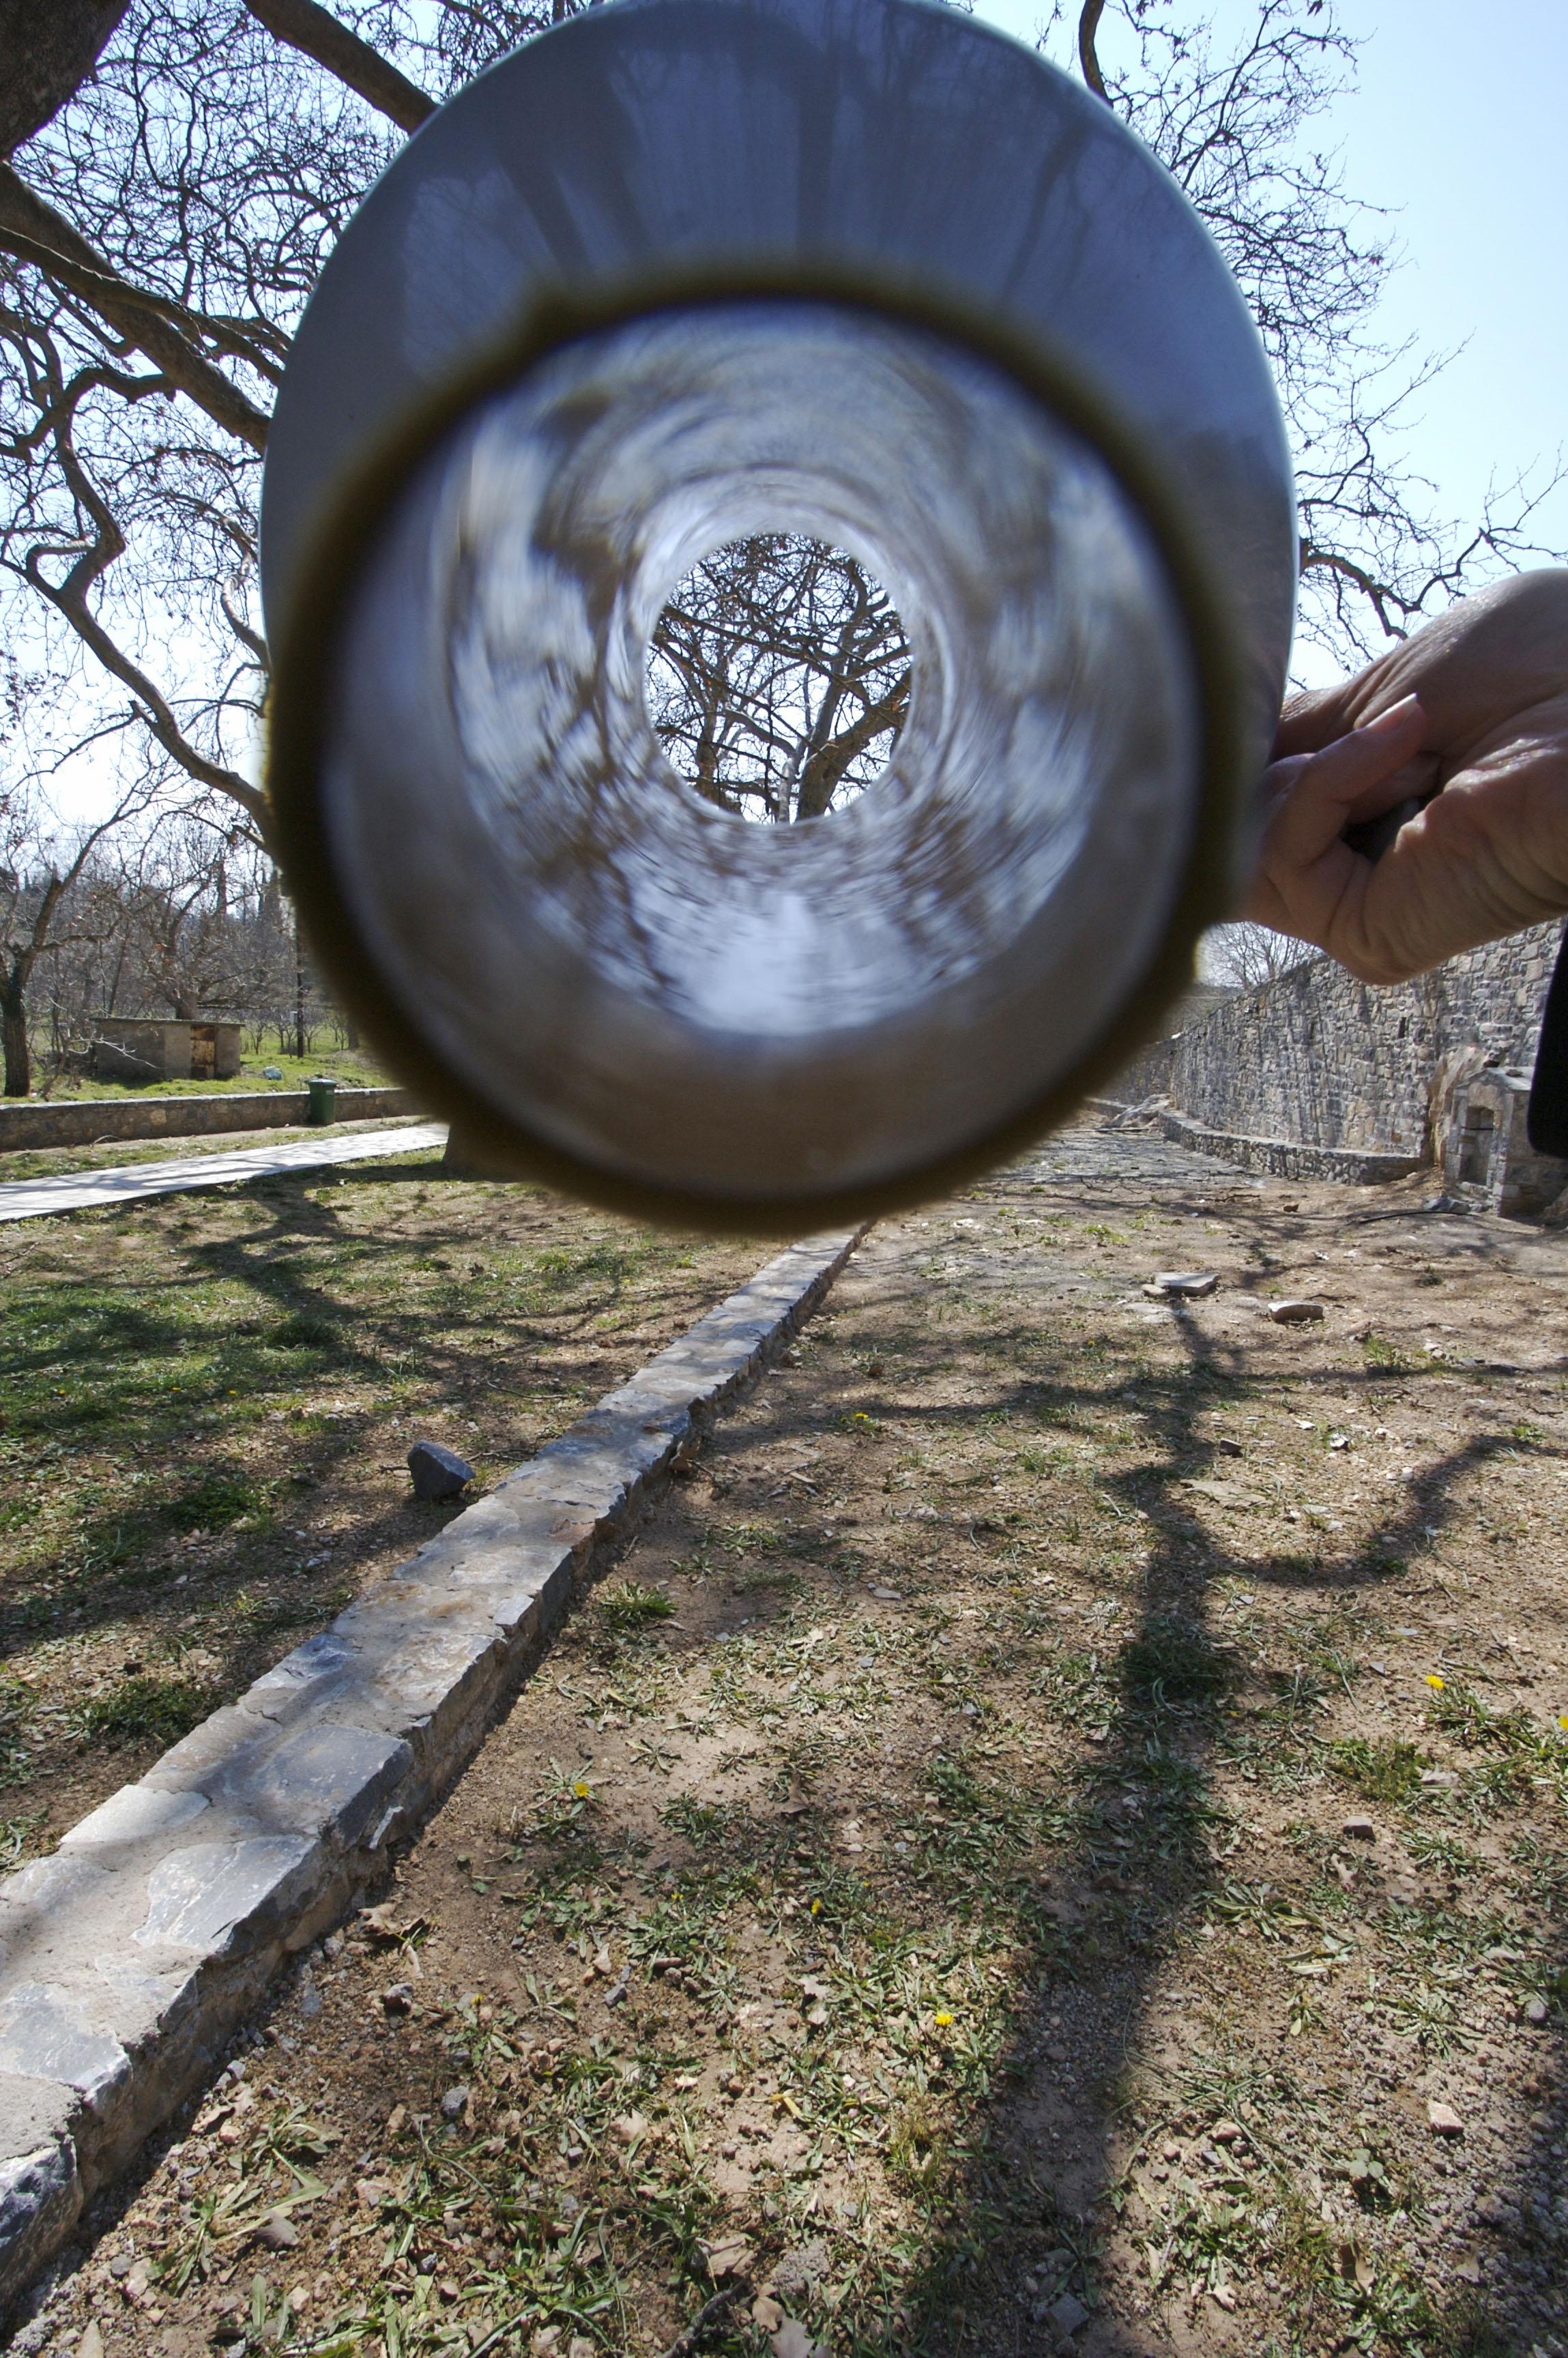 24.Magnifyingcone.jpg